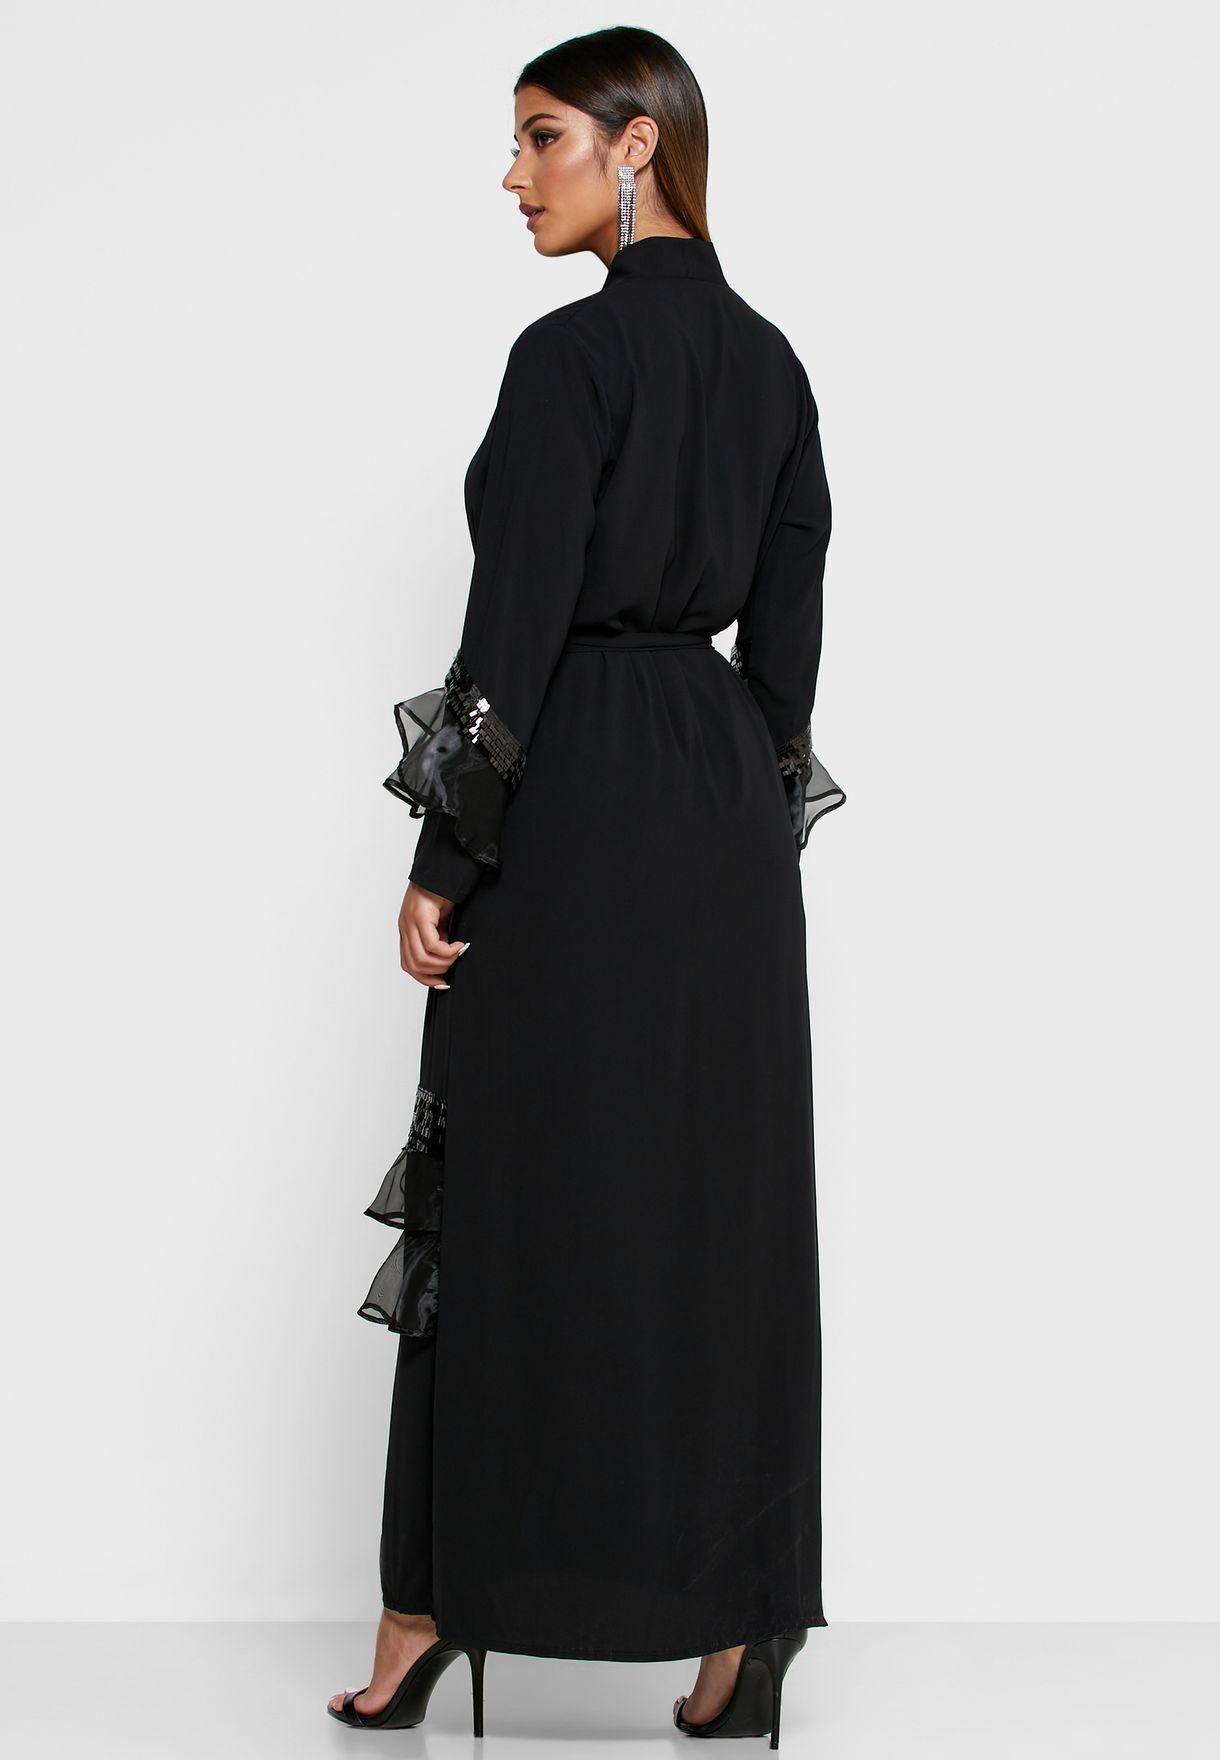 Sequin Ruffle Trim Self Tie Abaya